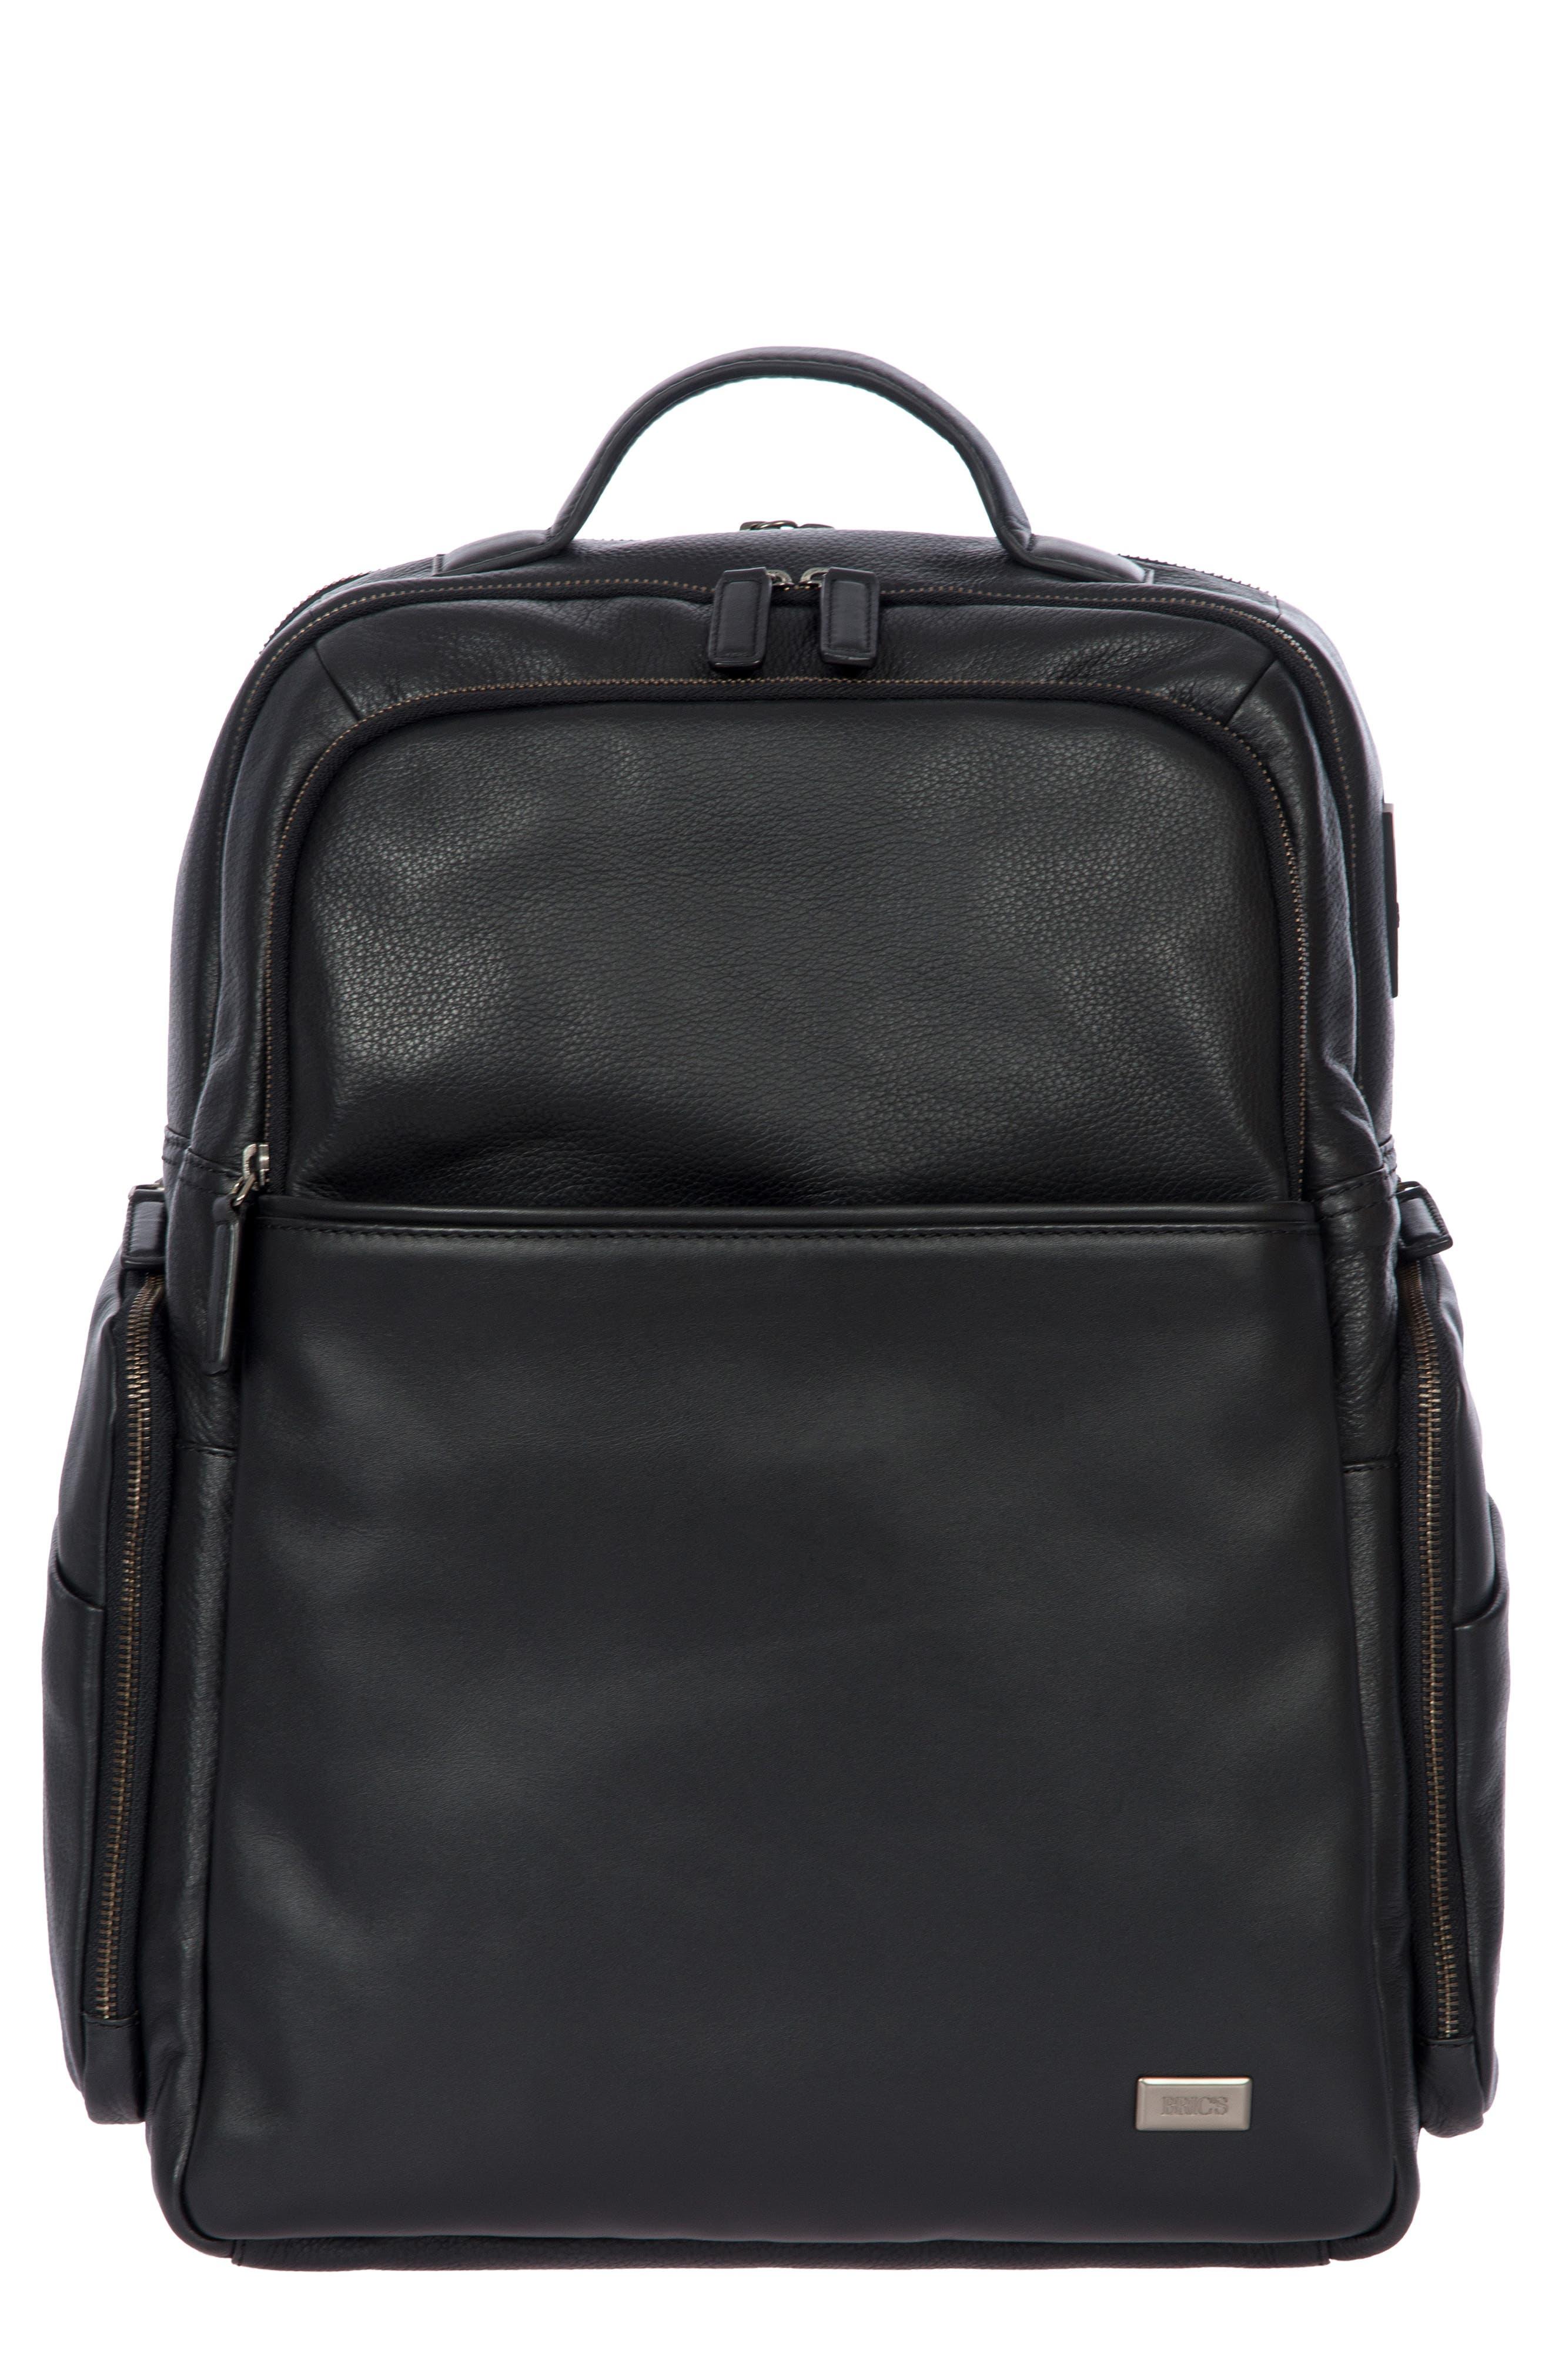 Torino Large Business Backpack - Black